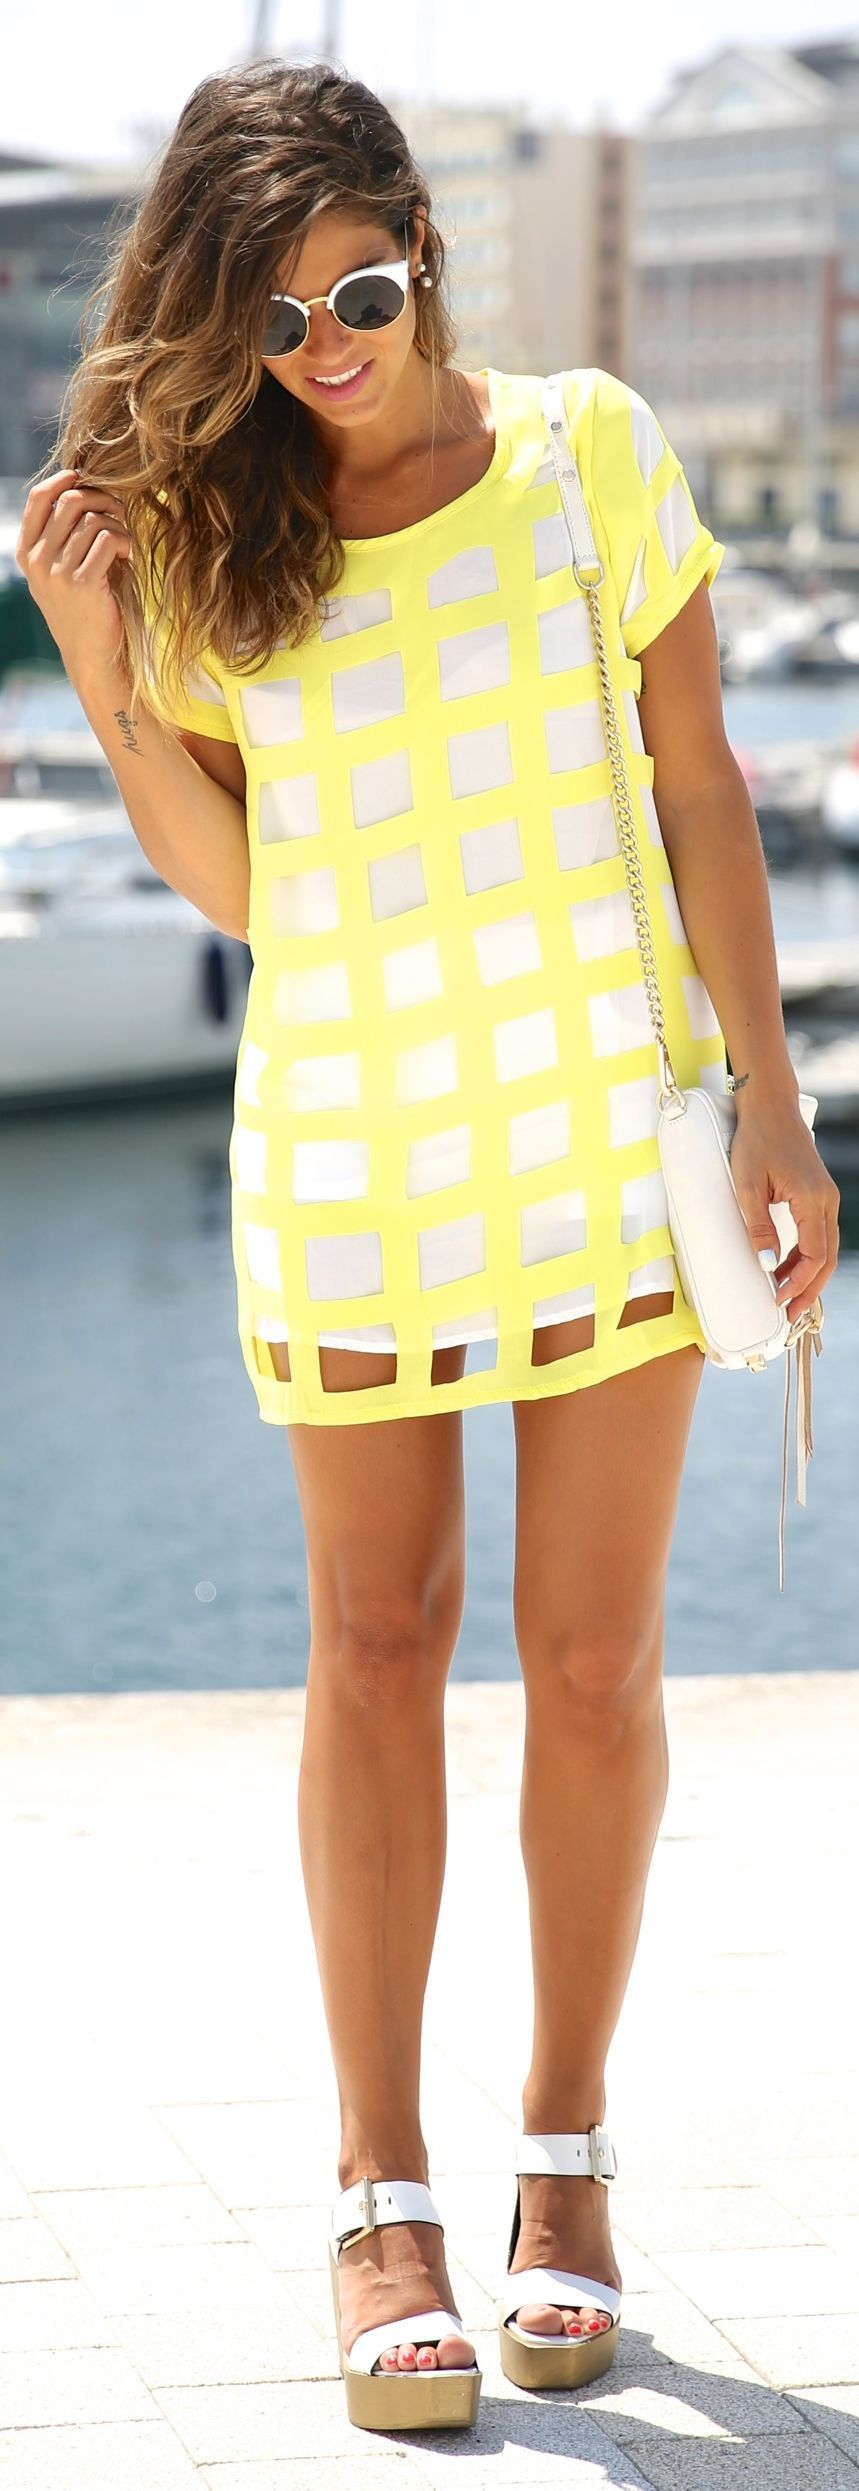 Choies neon yellow and white cutout windowpane mini tee dress by